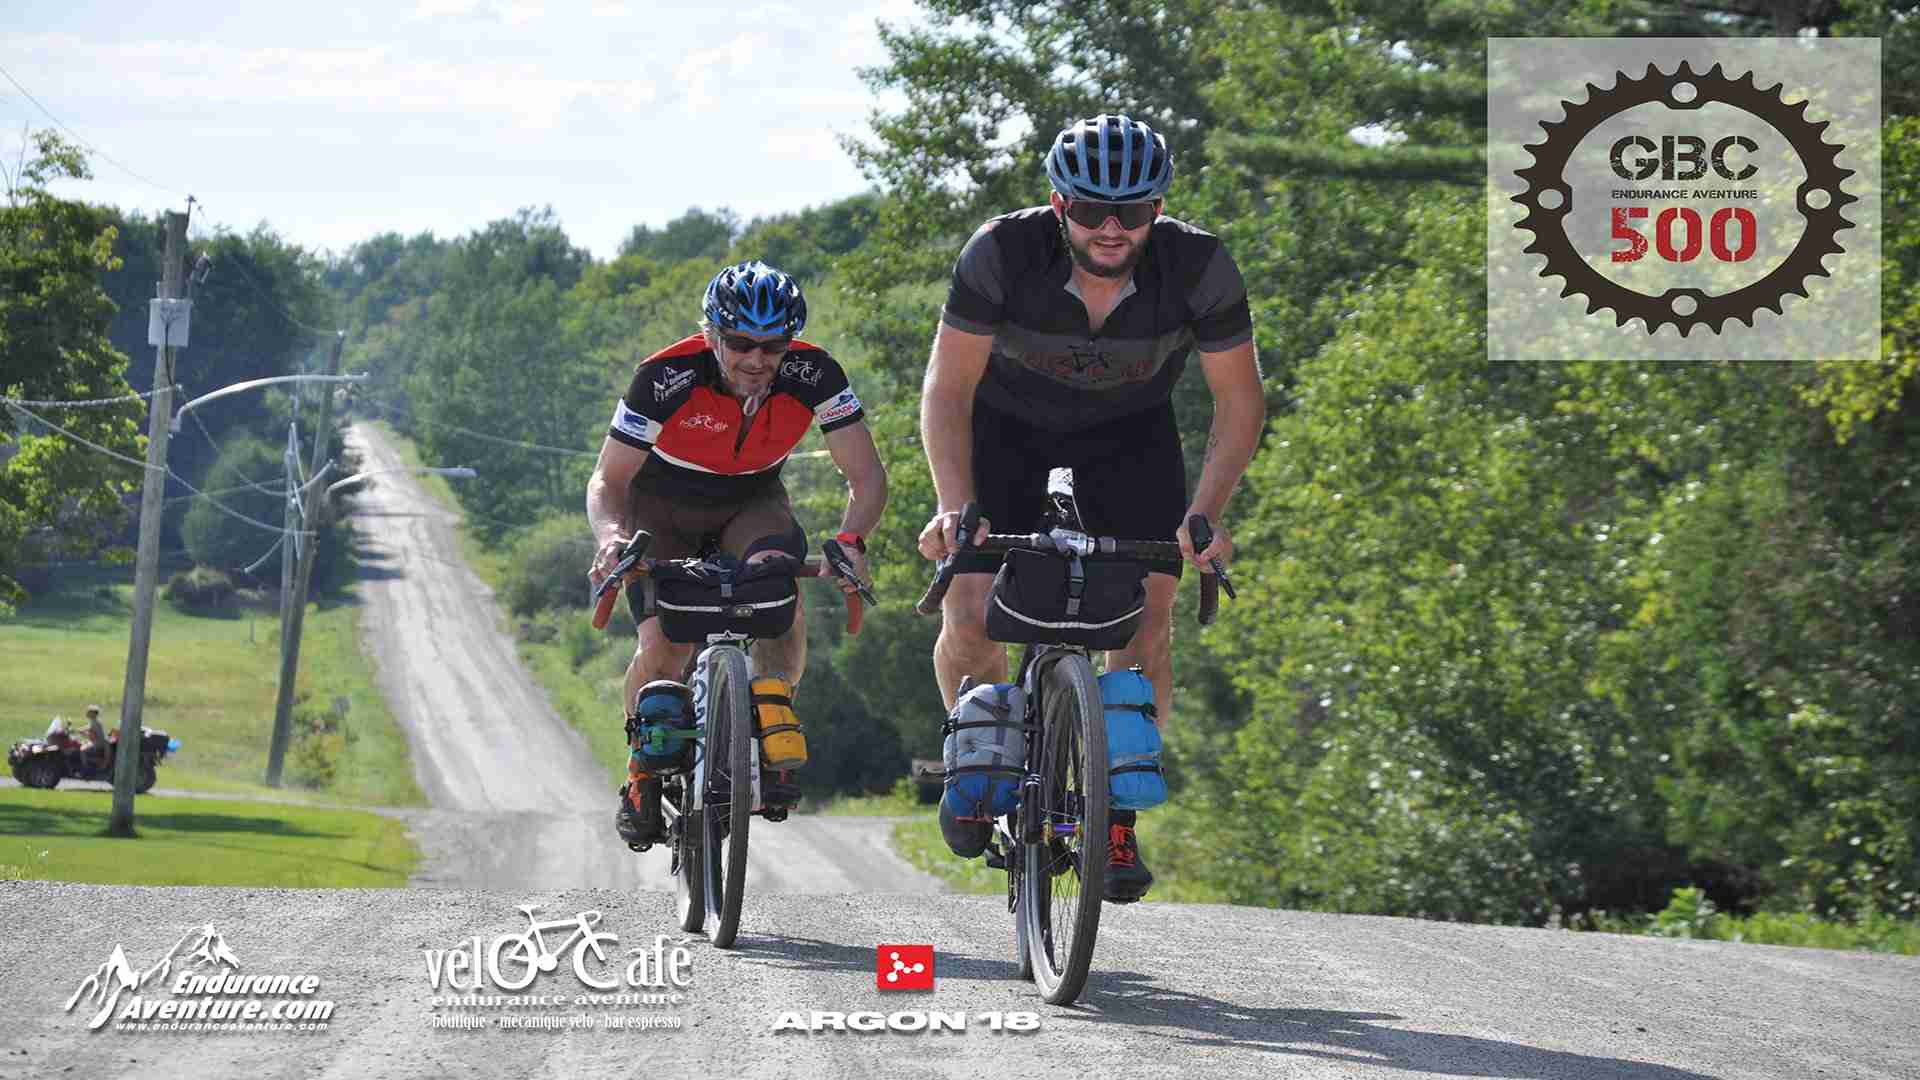 Endurance Aventure – Le Gravel Bikepacking Challenge 500 * GBC 500